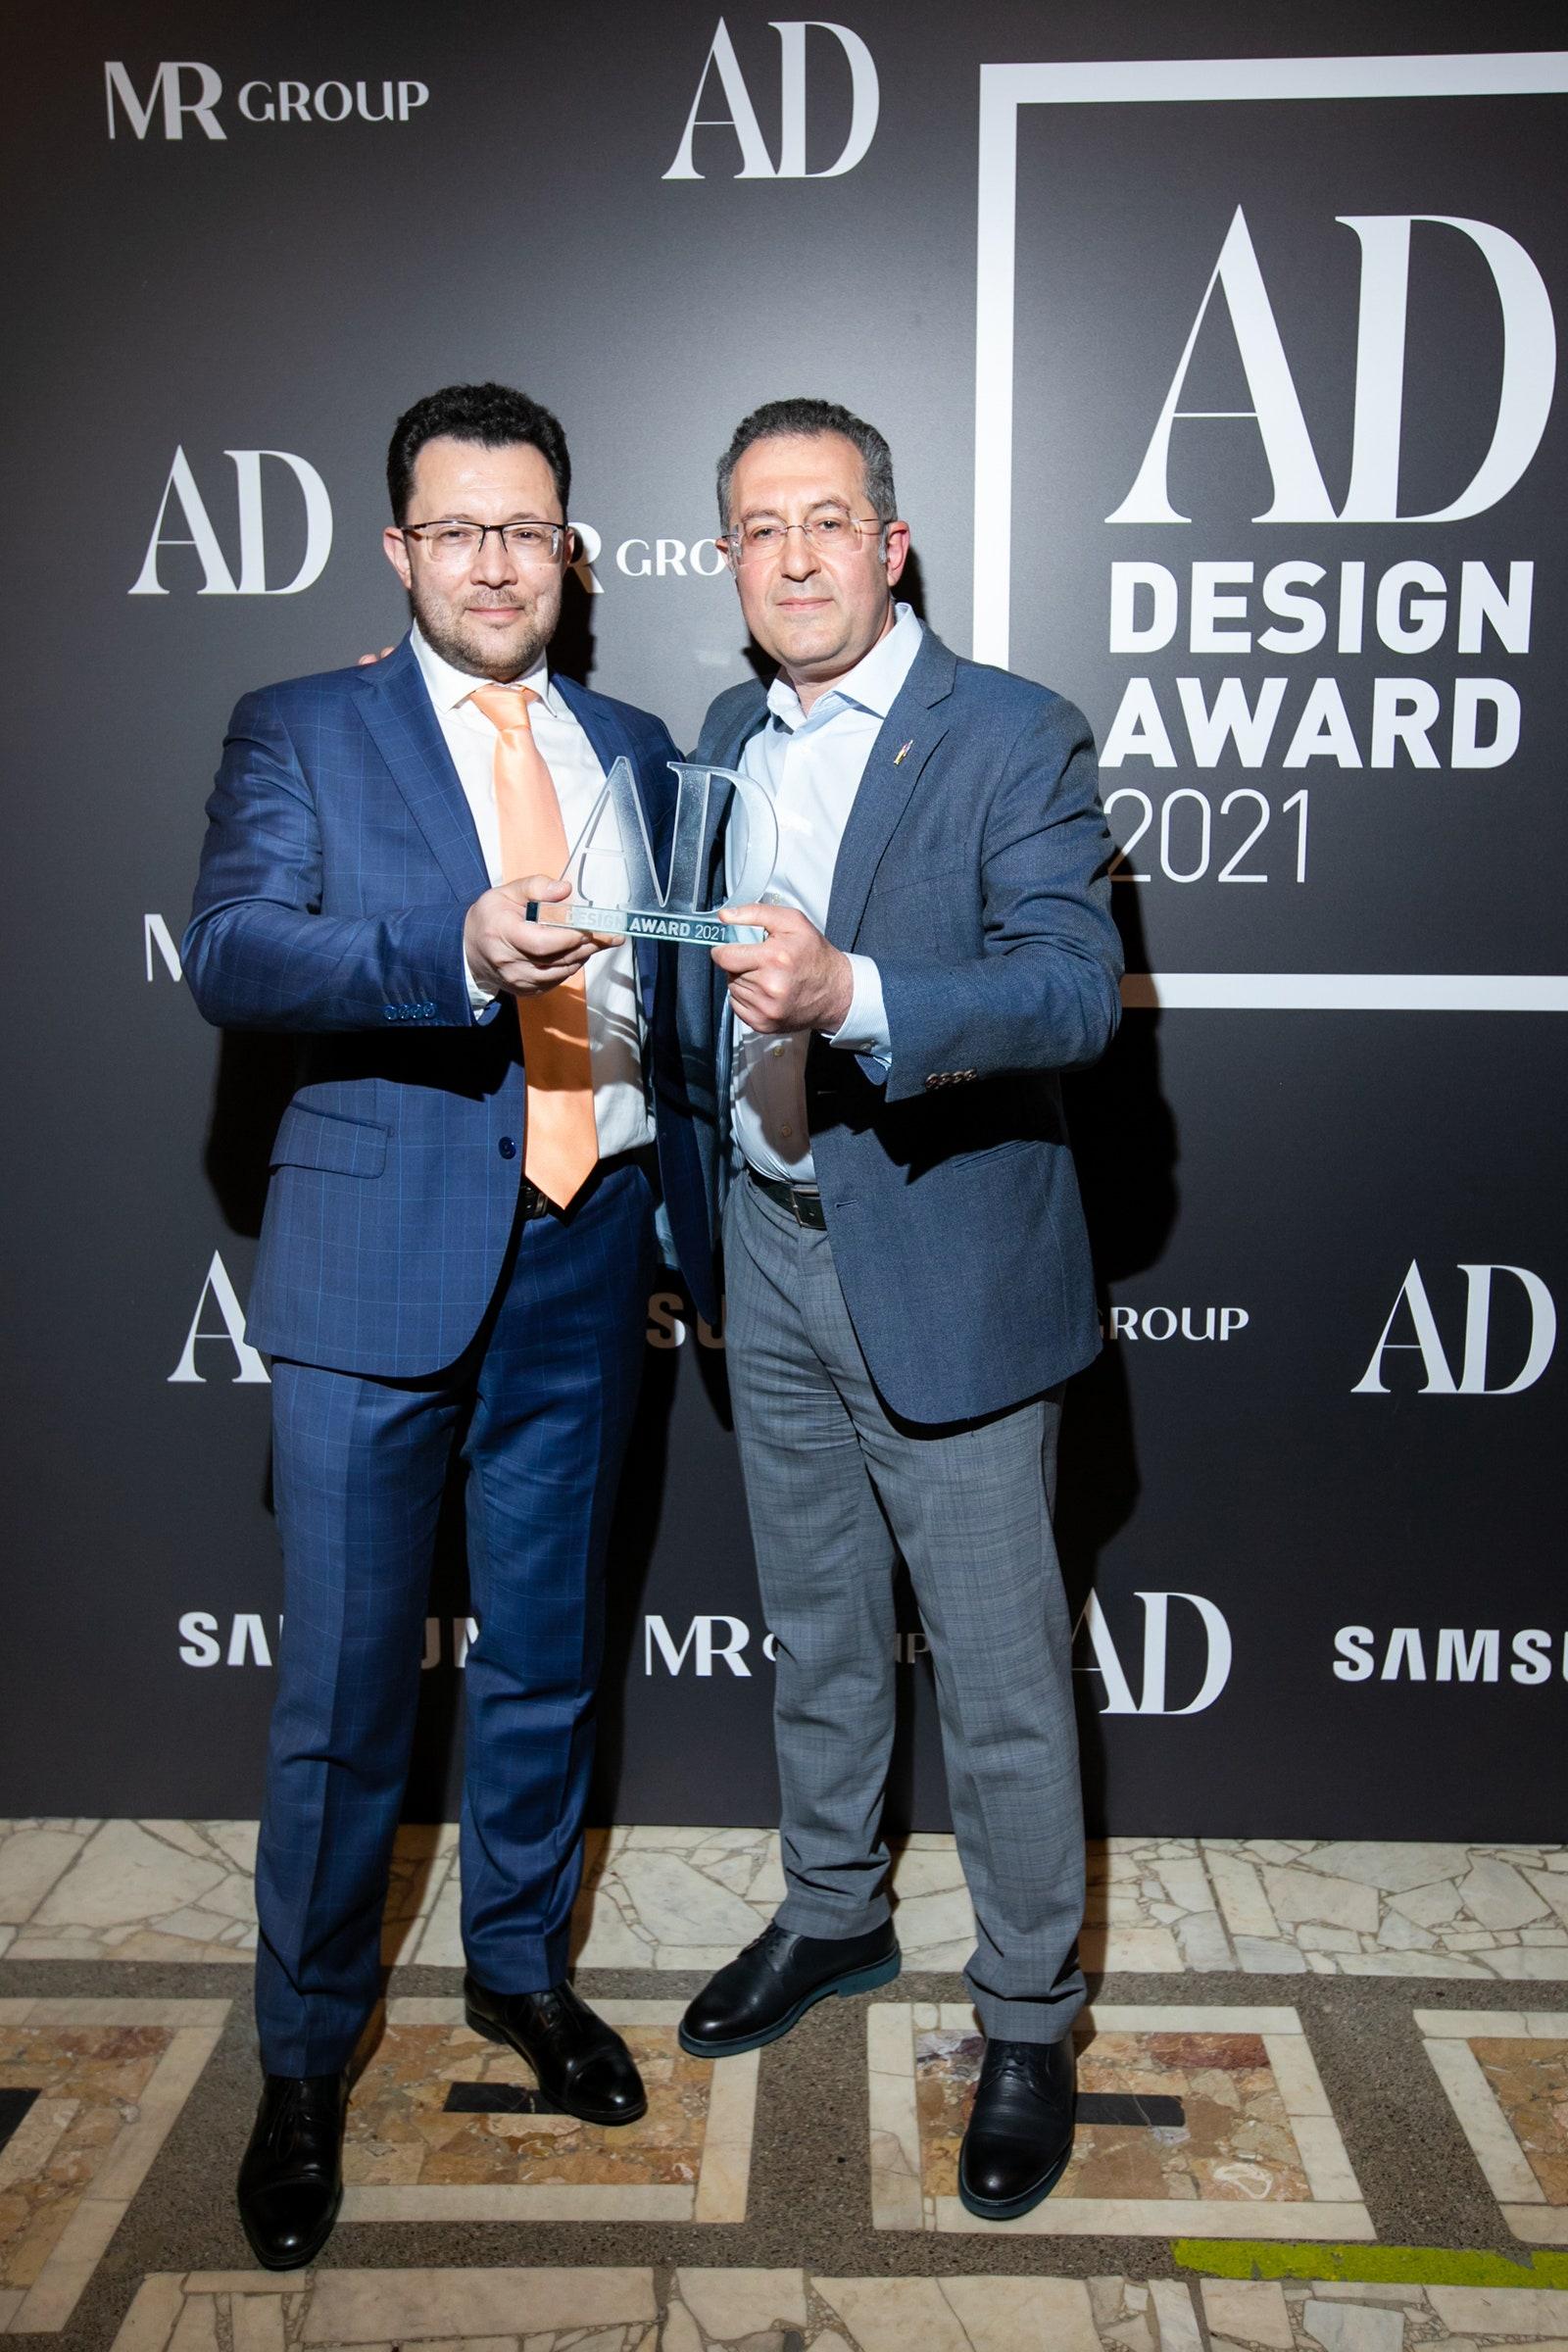 AD Design Award 2021